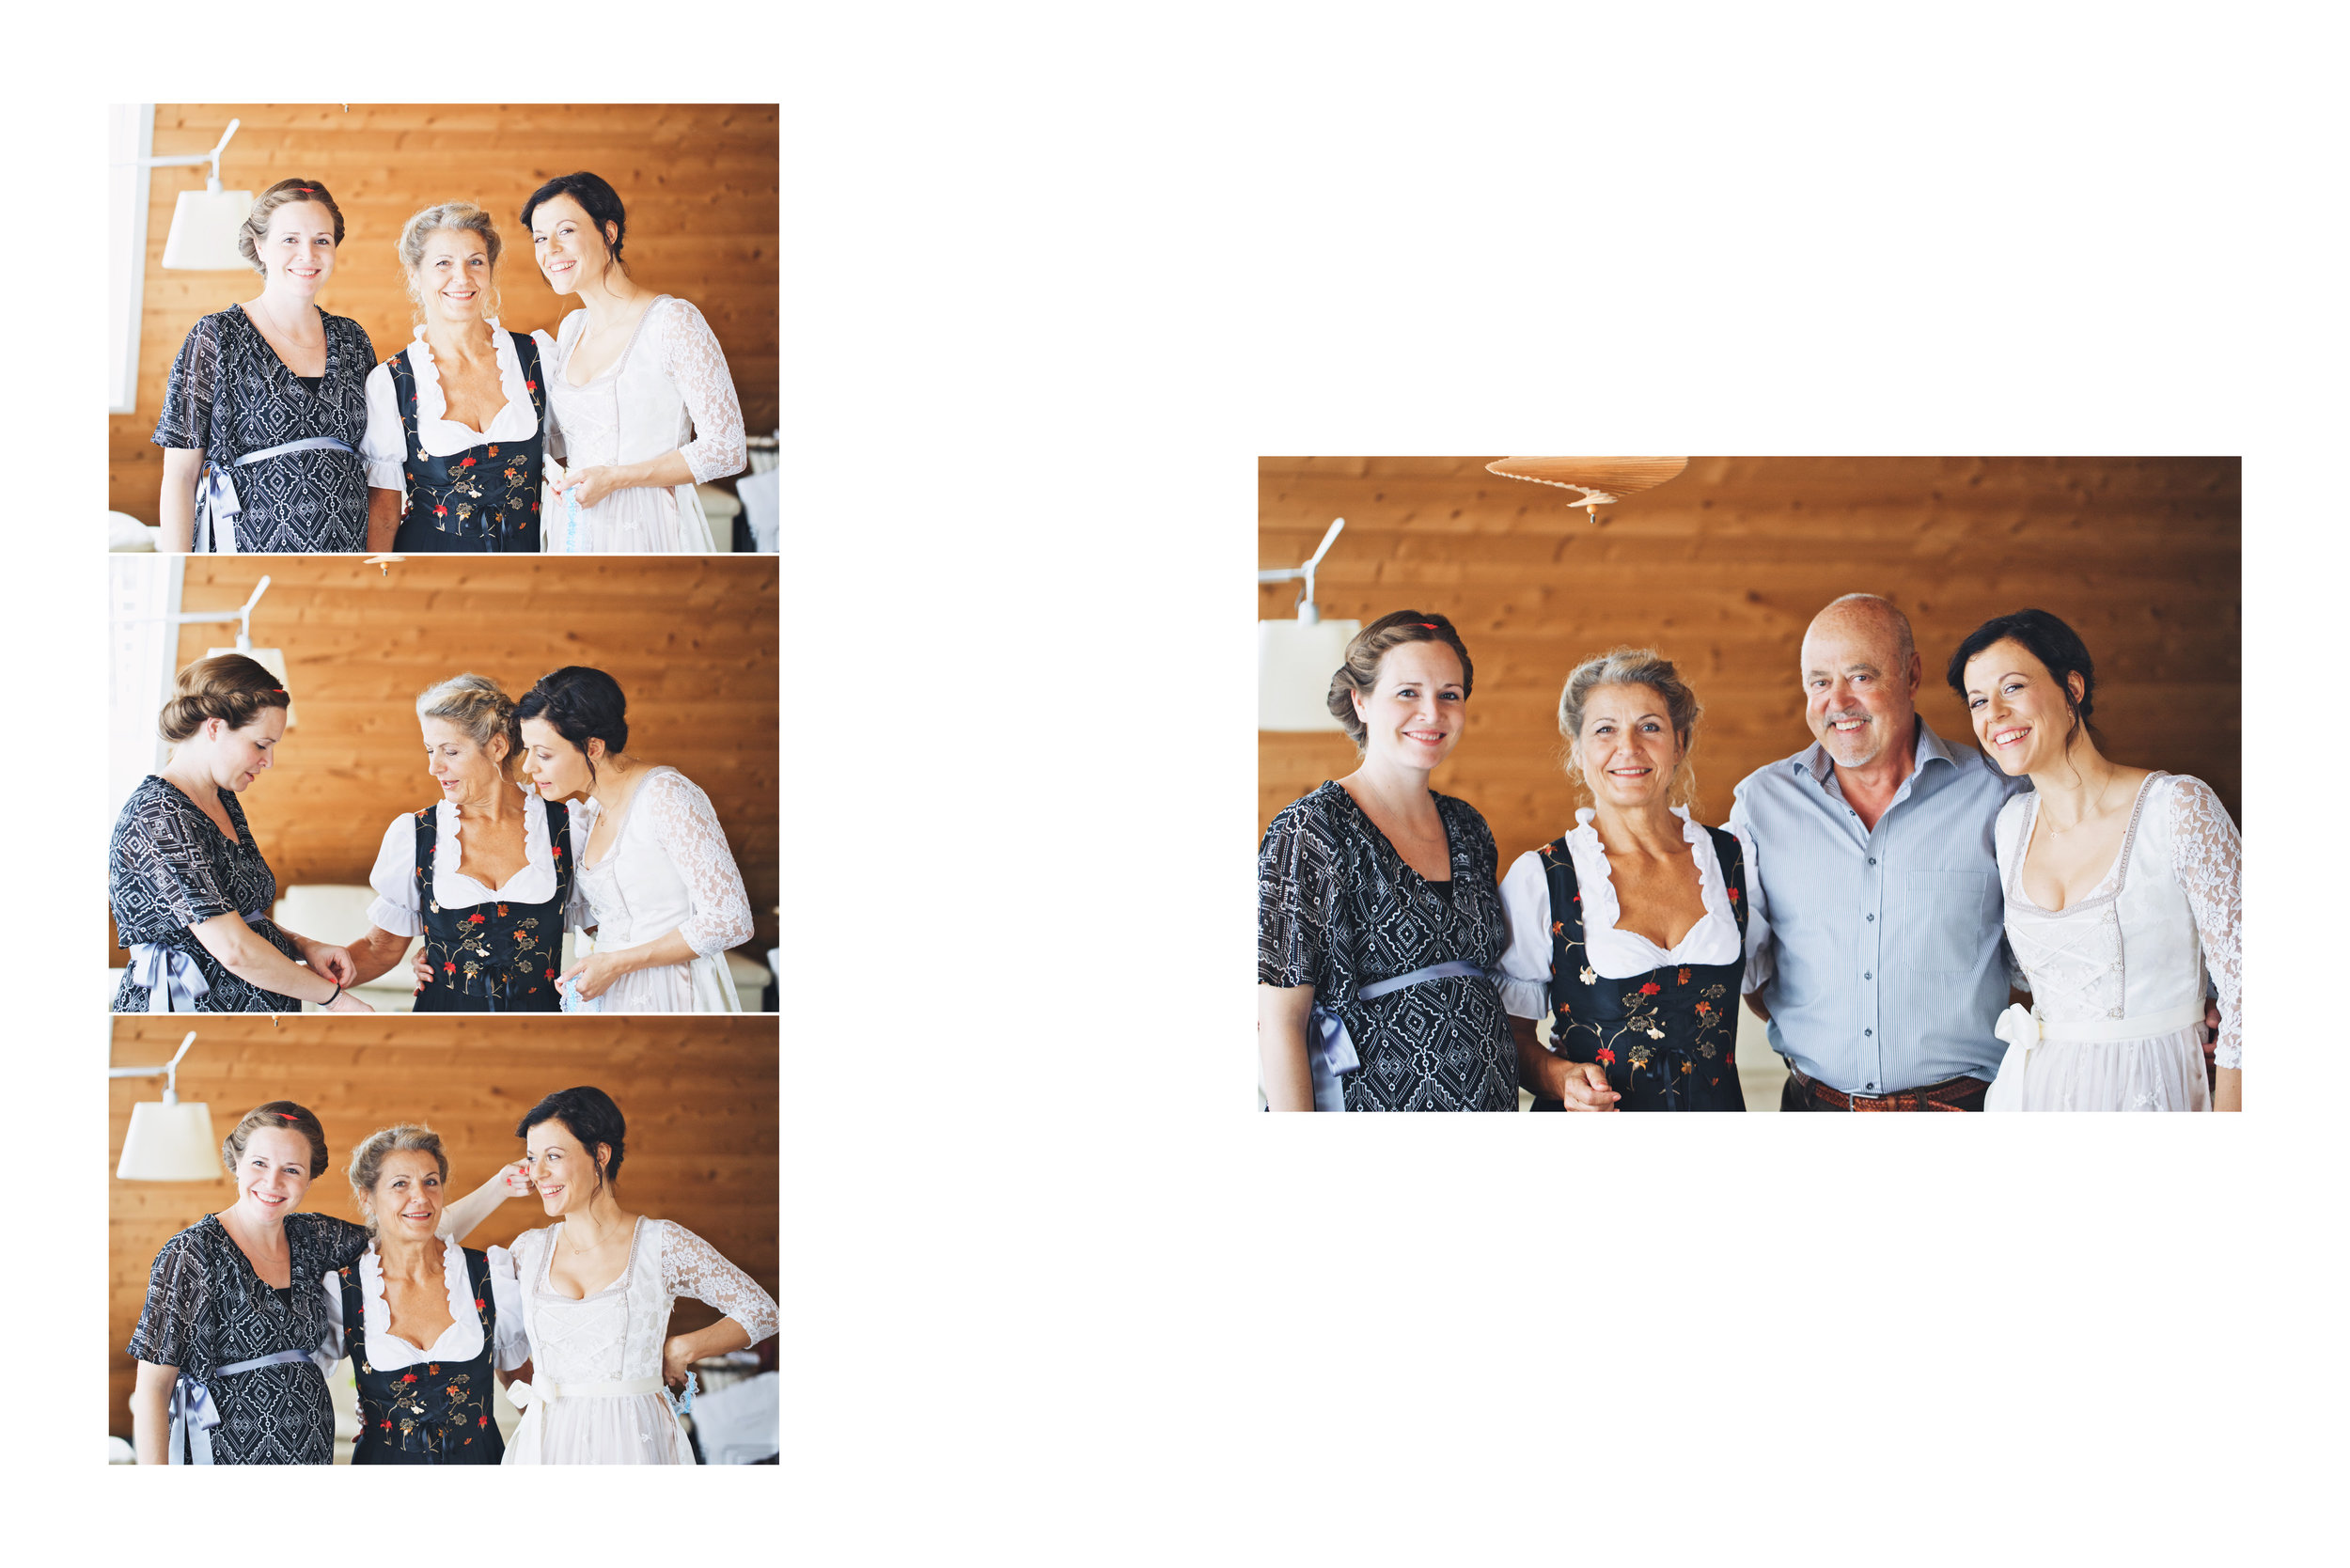 Katrin&_Michael_04.jpg